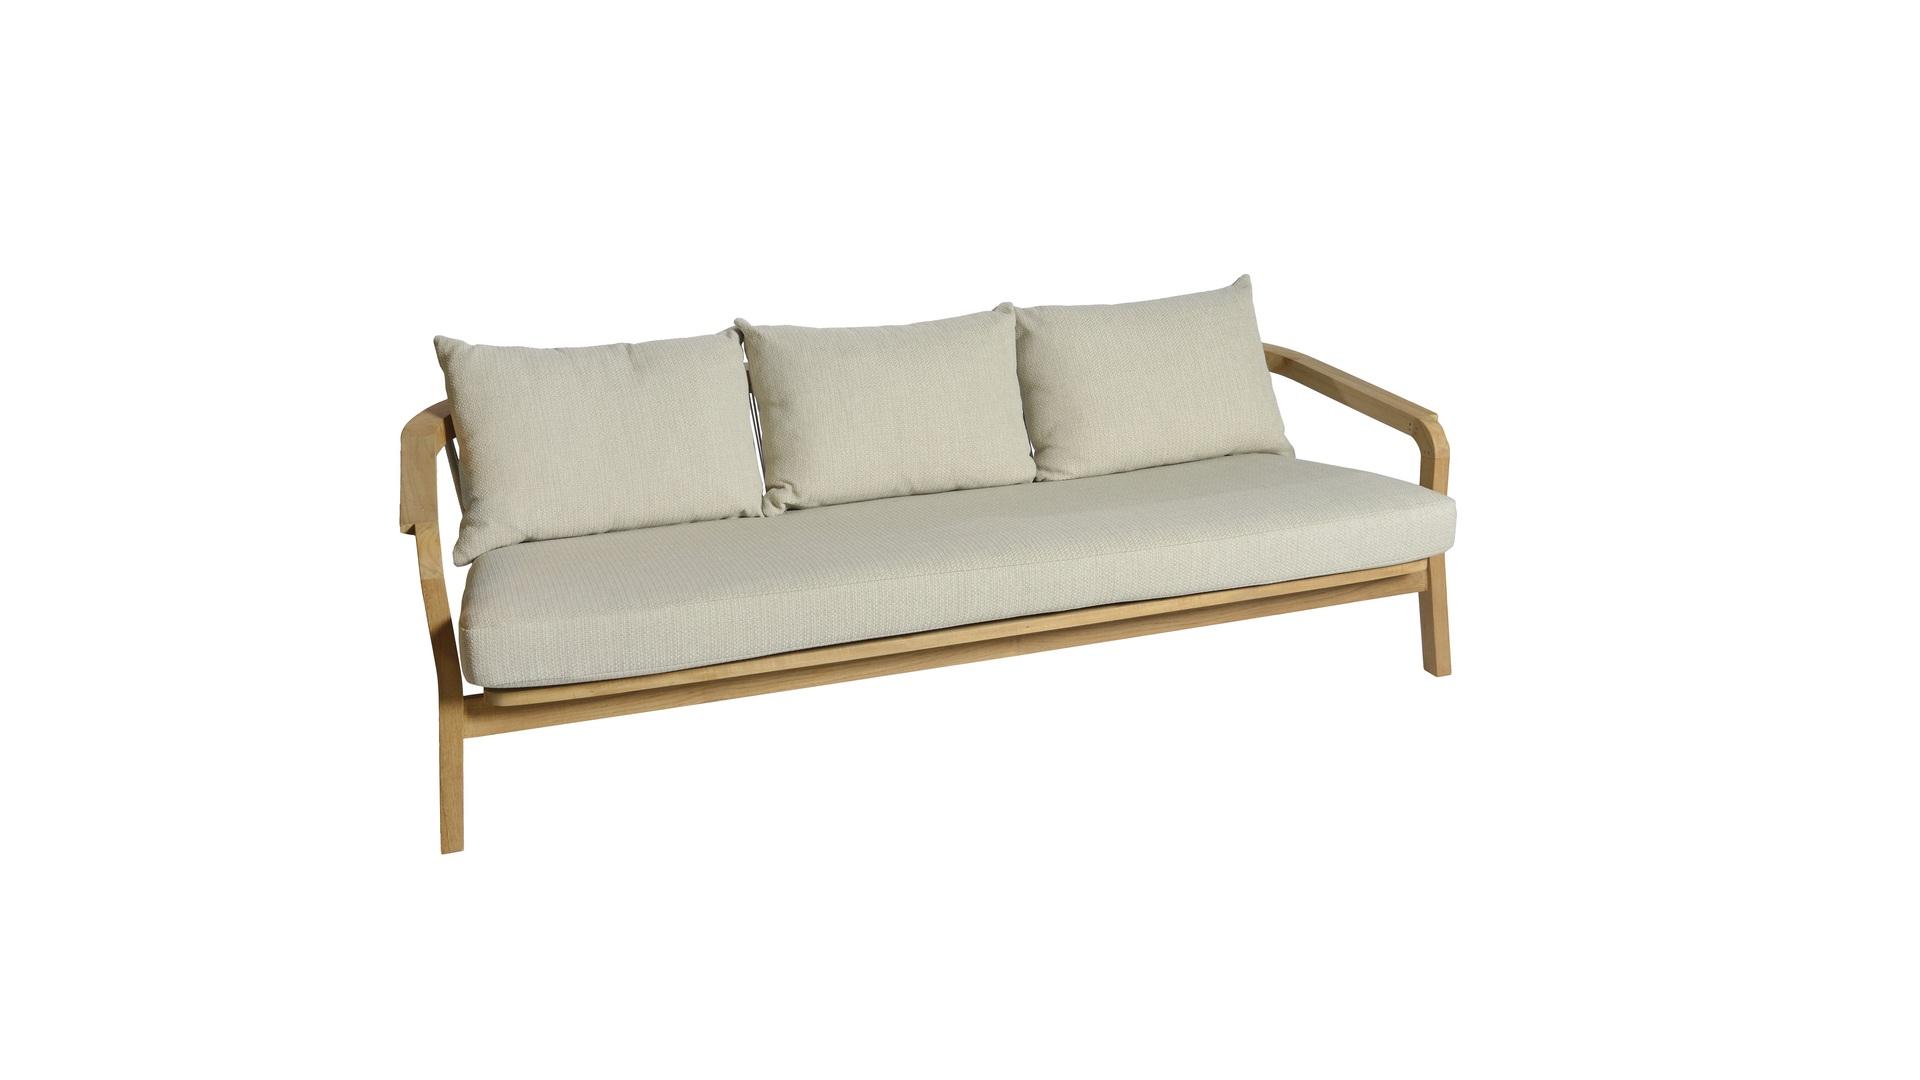 2020 Borek teak Chepri sofa 5683 3.jpg